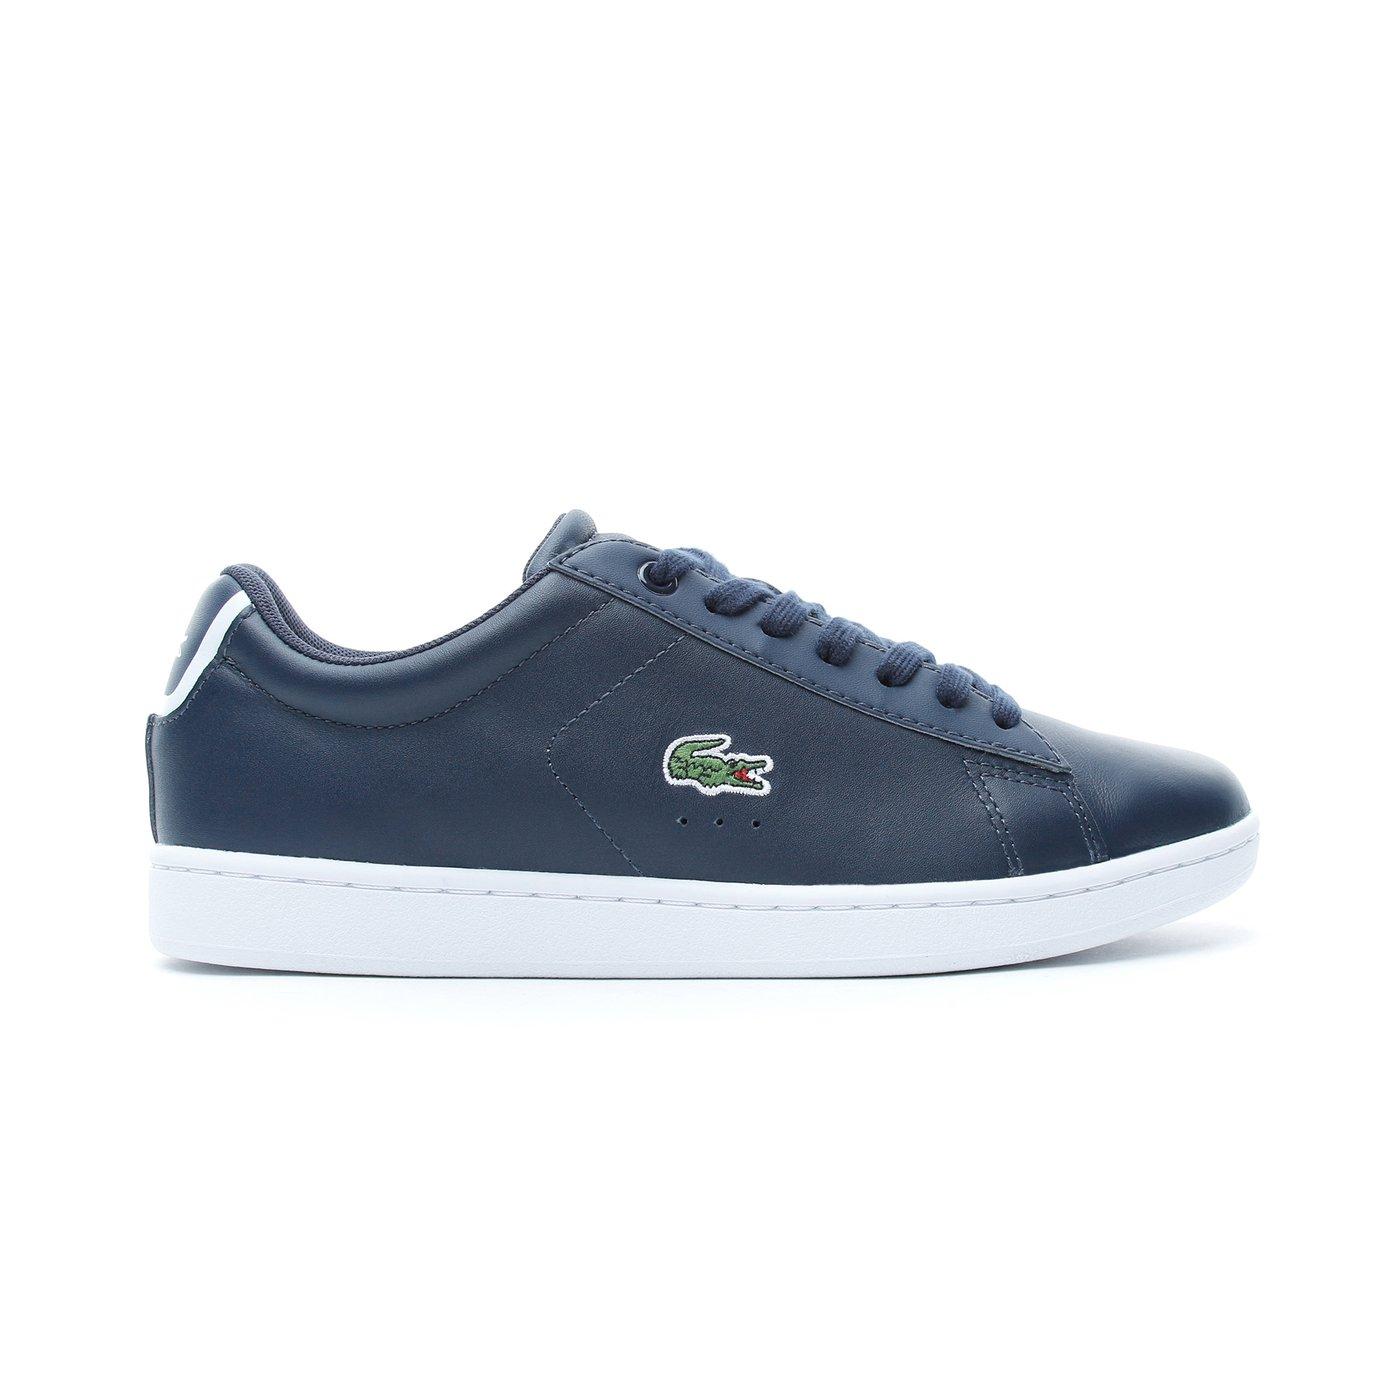 Lacoste Carnaby Evo BL 1 Kadın Lacivert Sneaker